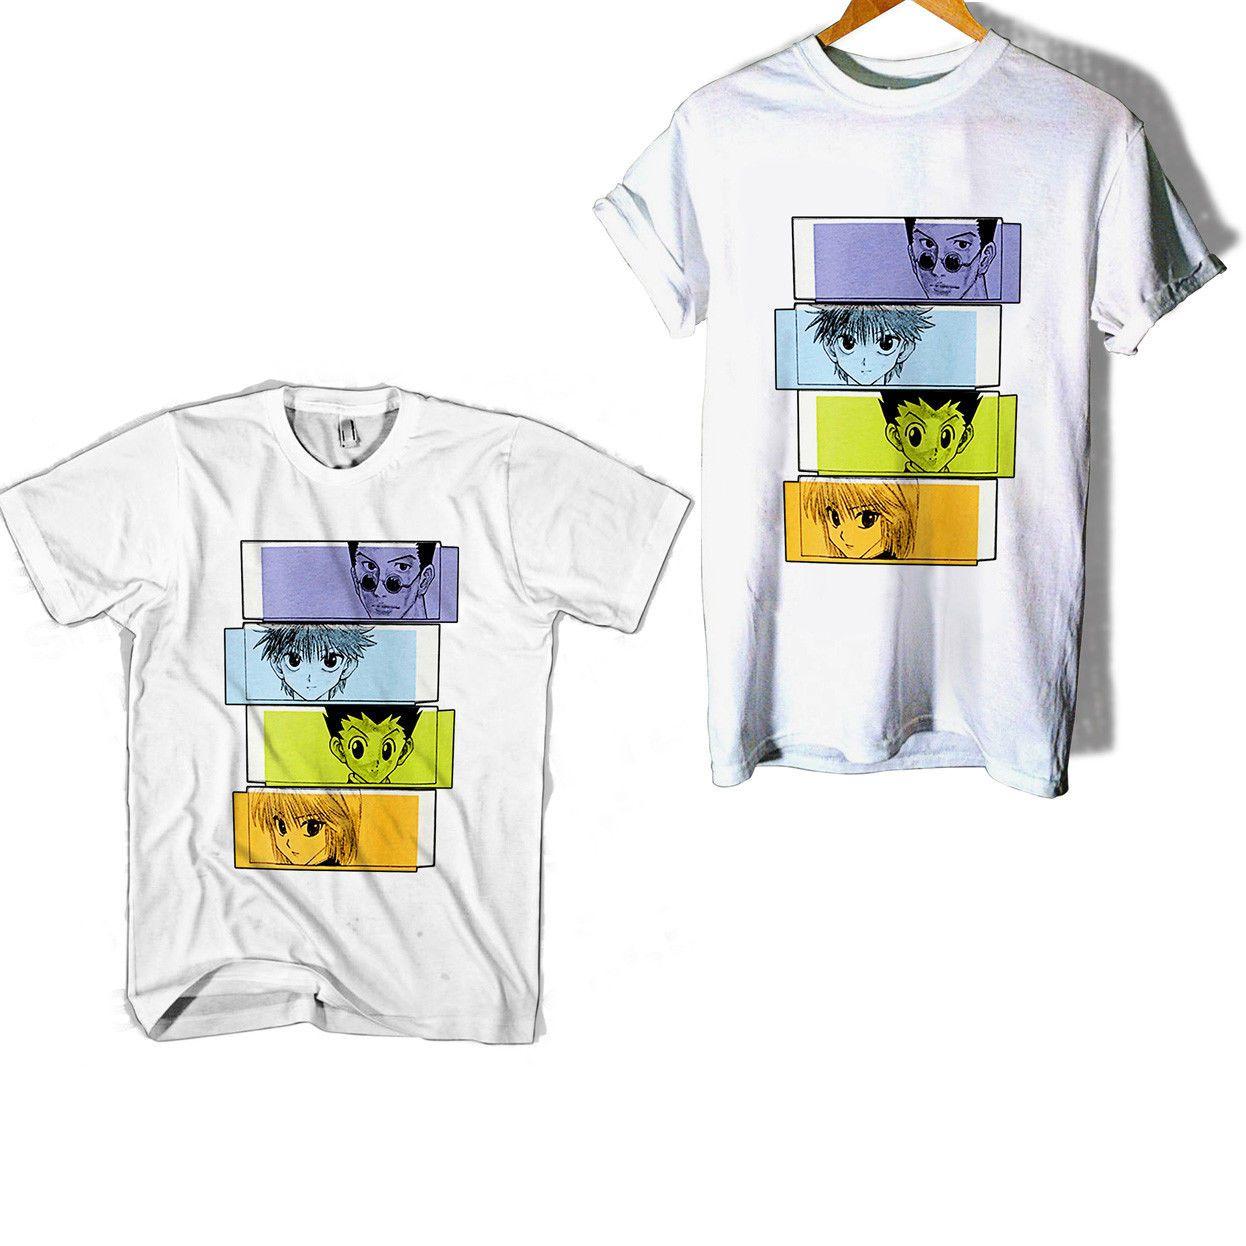 96642285bdb Weekly Shonen Jump X Uniqlo Hunter X Hunter Man   Woman T Shirt Funny  Unisex Casual Tee Gift Top Cool T Shirts Design Designs Shirts From  Universal fashion